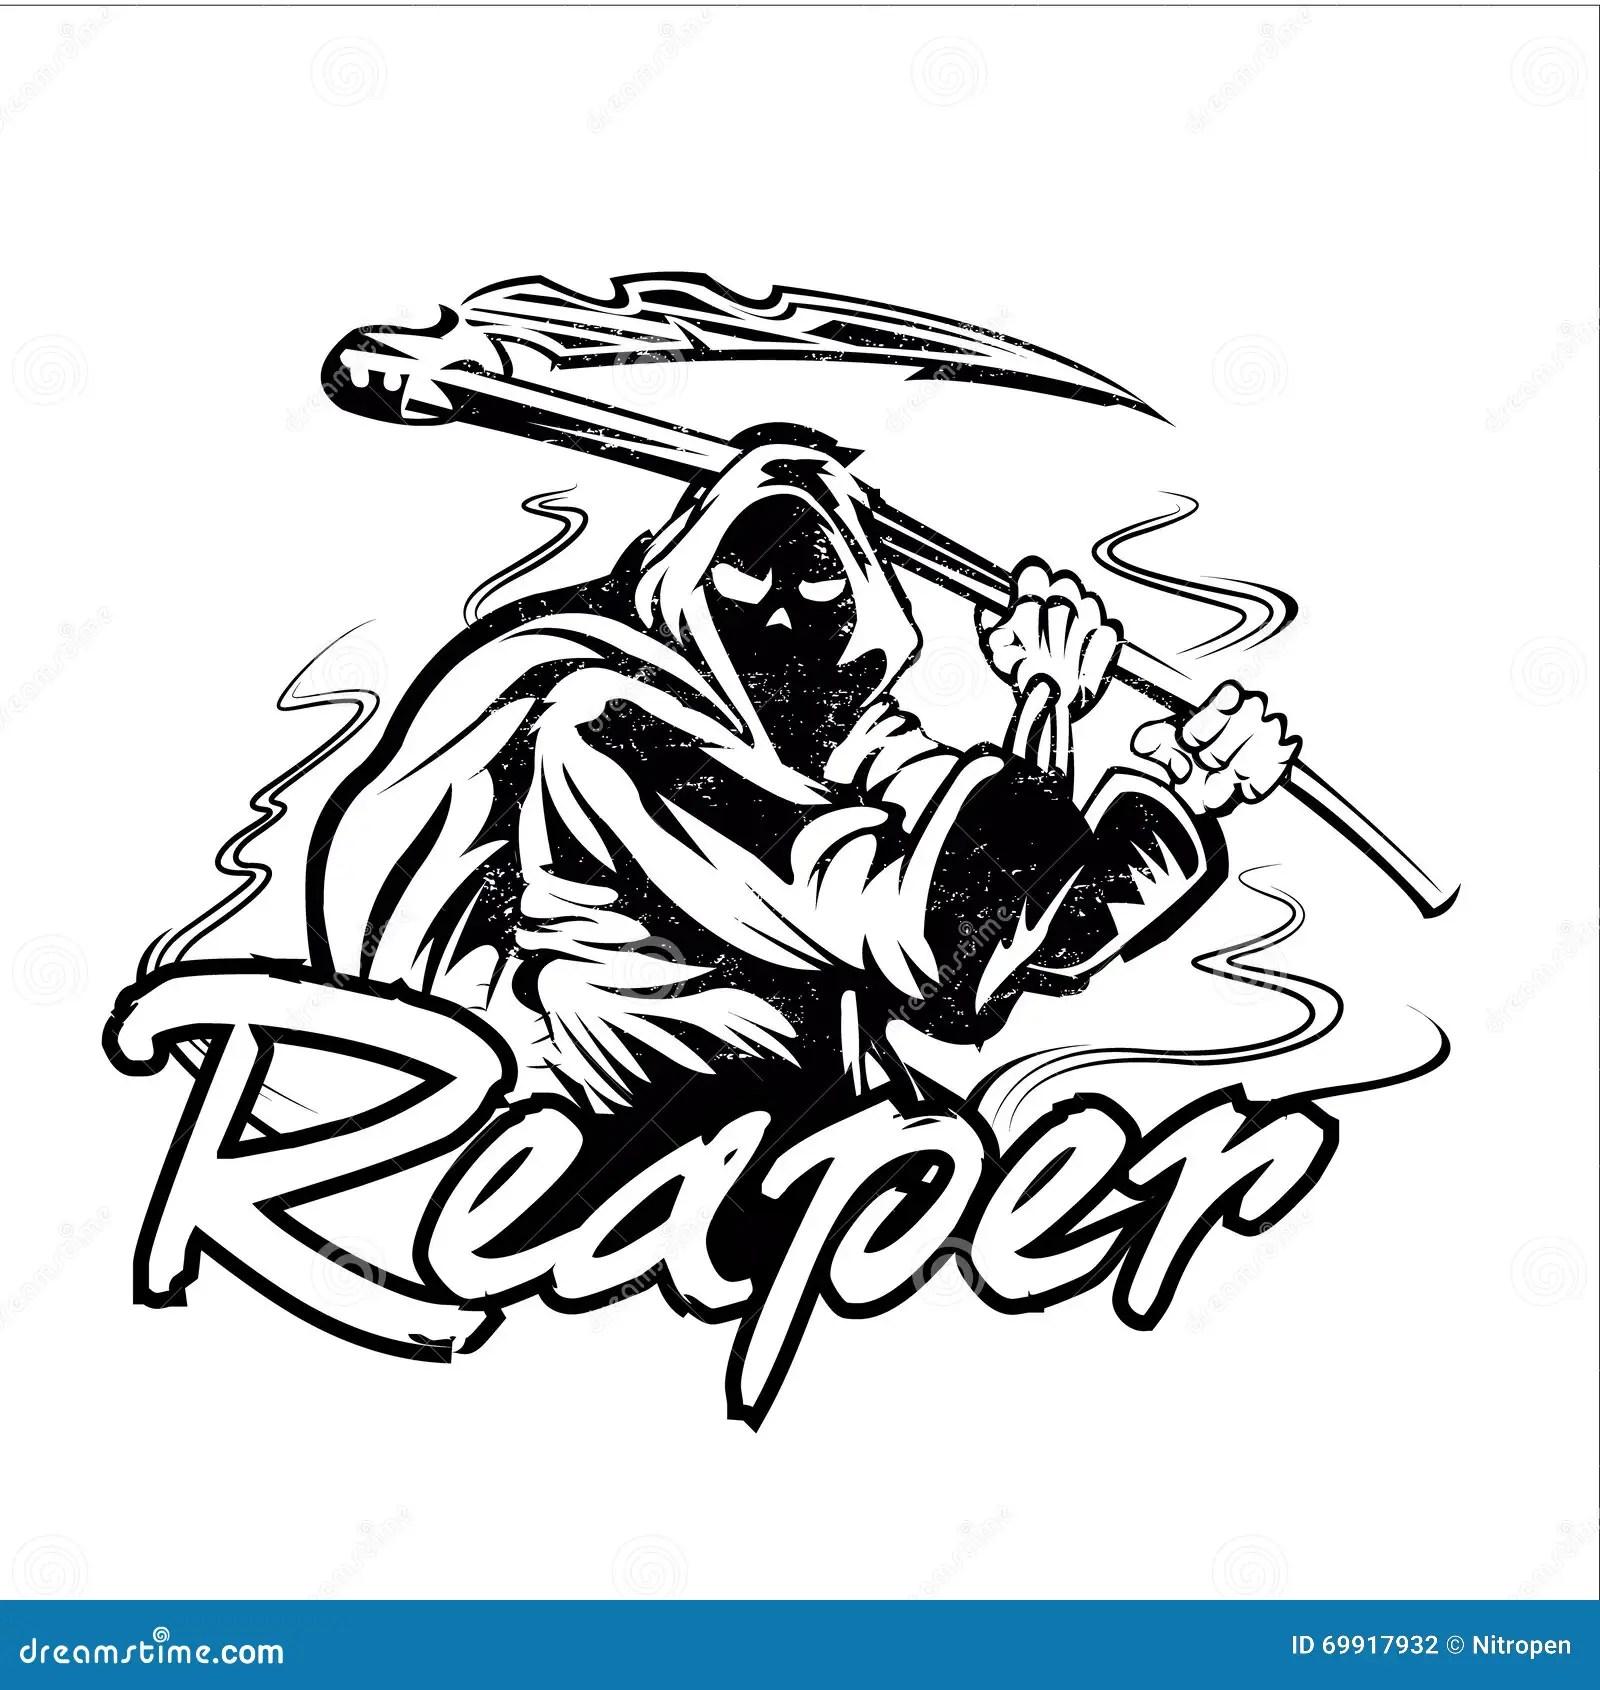 Grim Reaper Illustration Royalty Free Stock Image